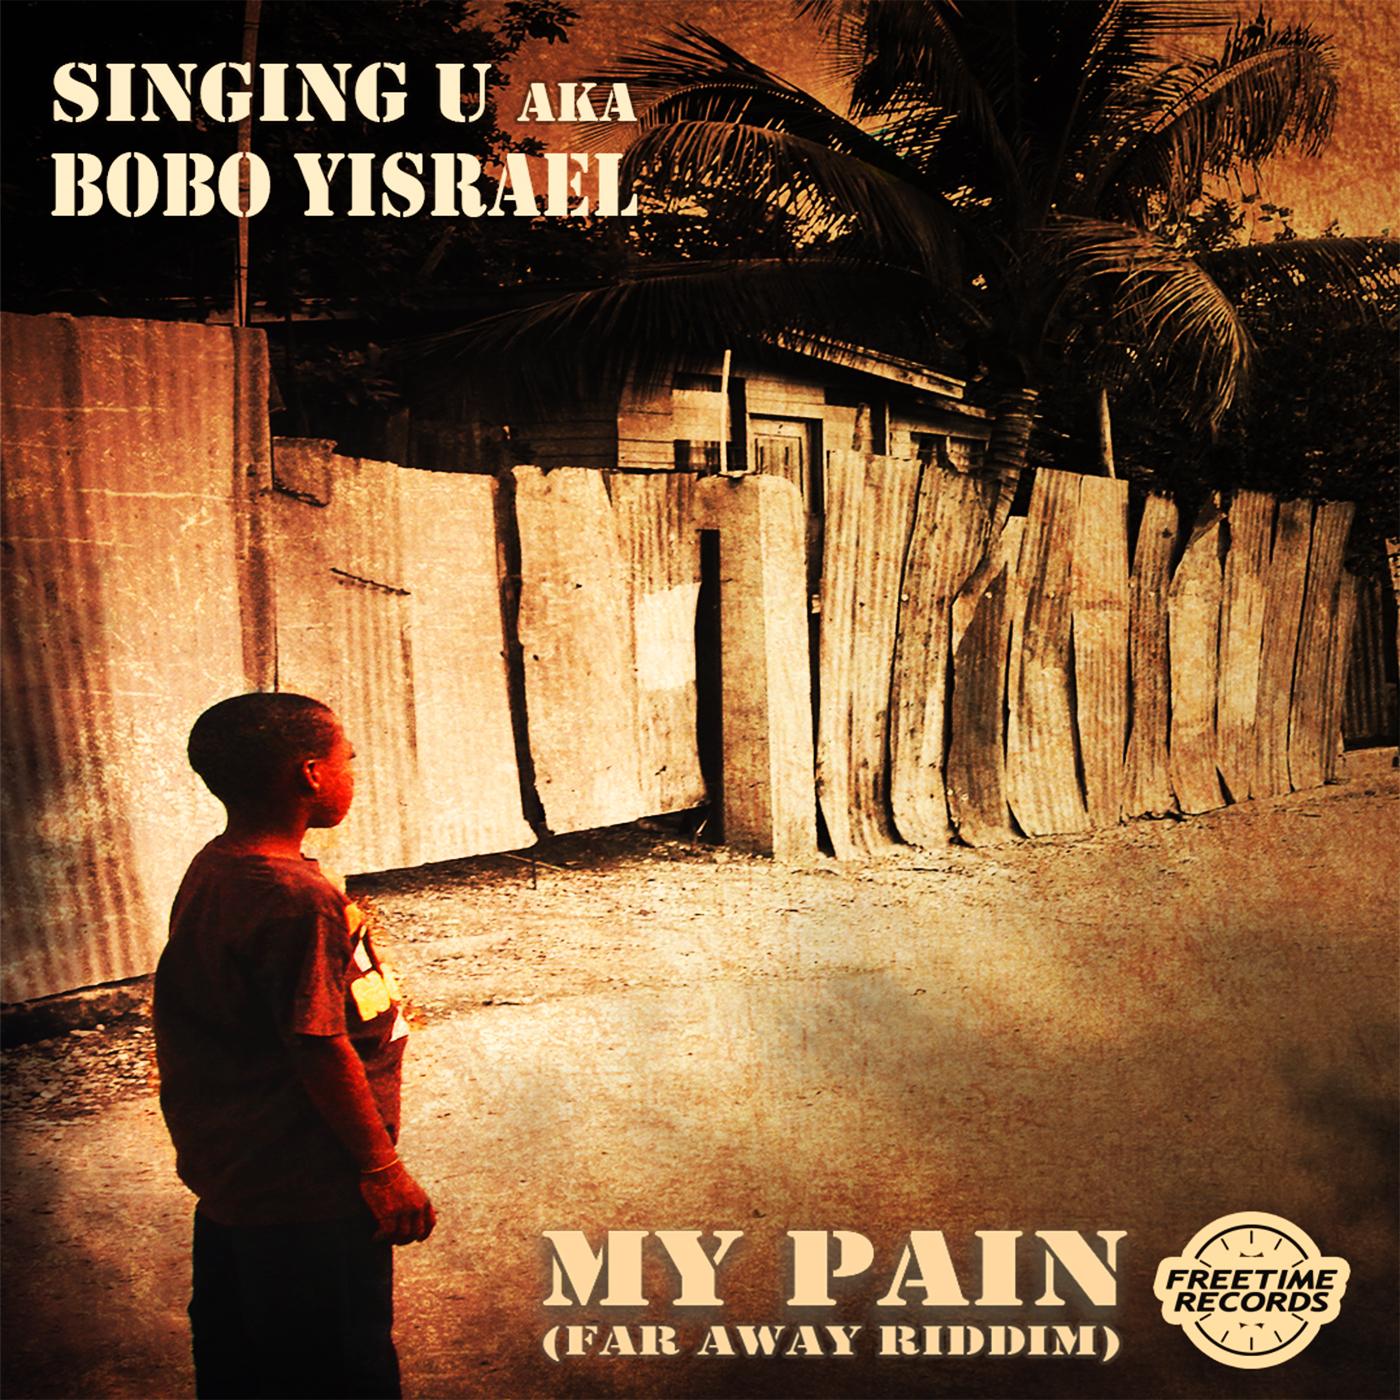 Singing U aka Bobo Yisrael - My Pain (Single)